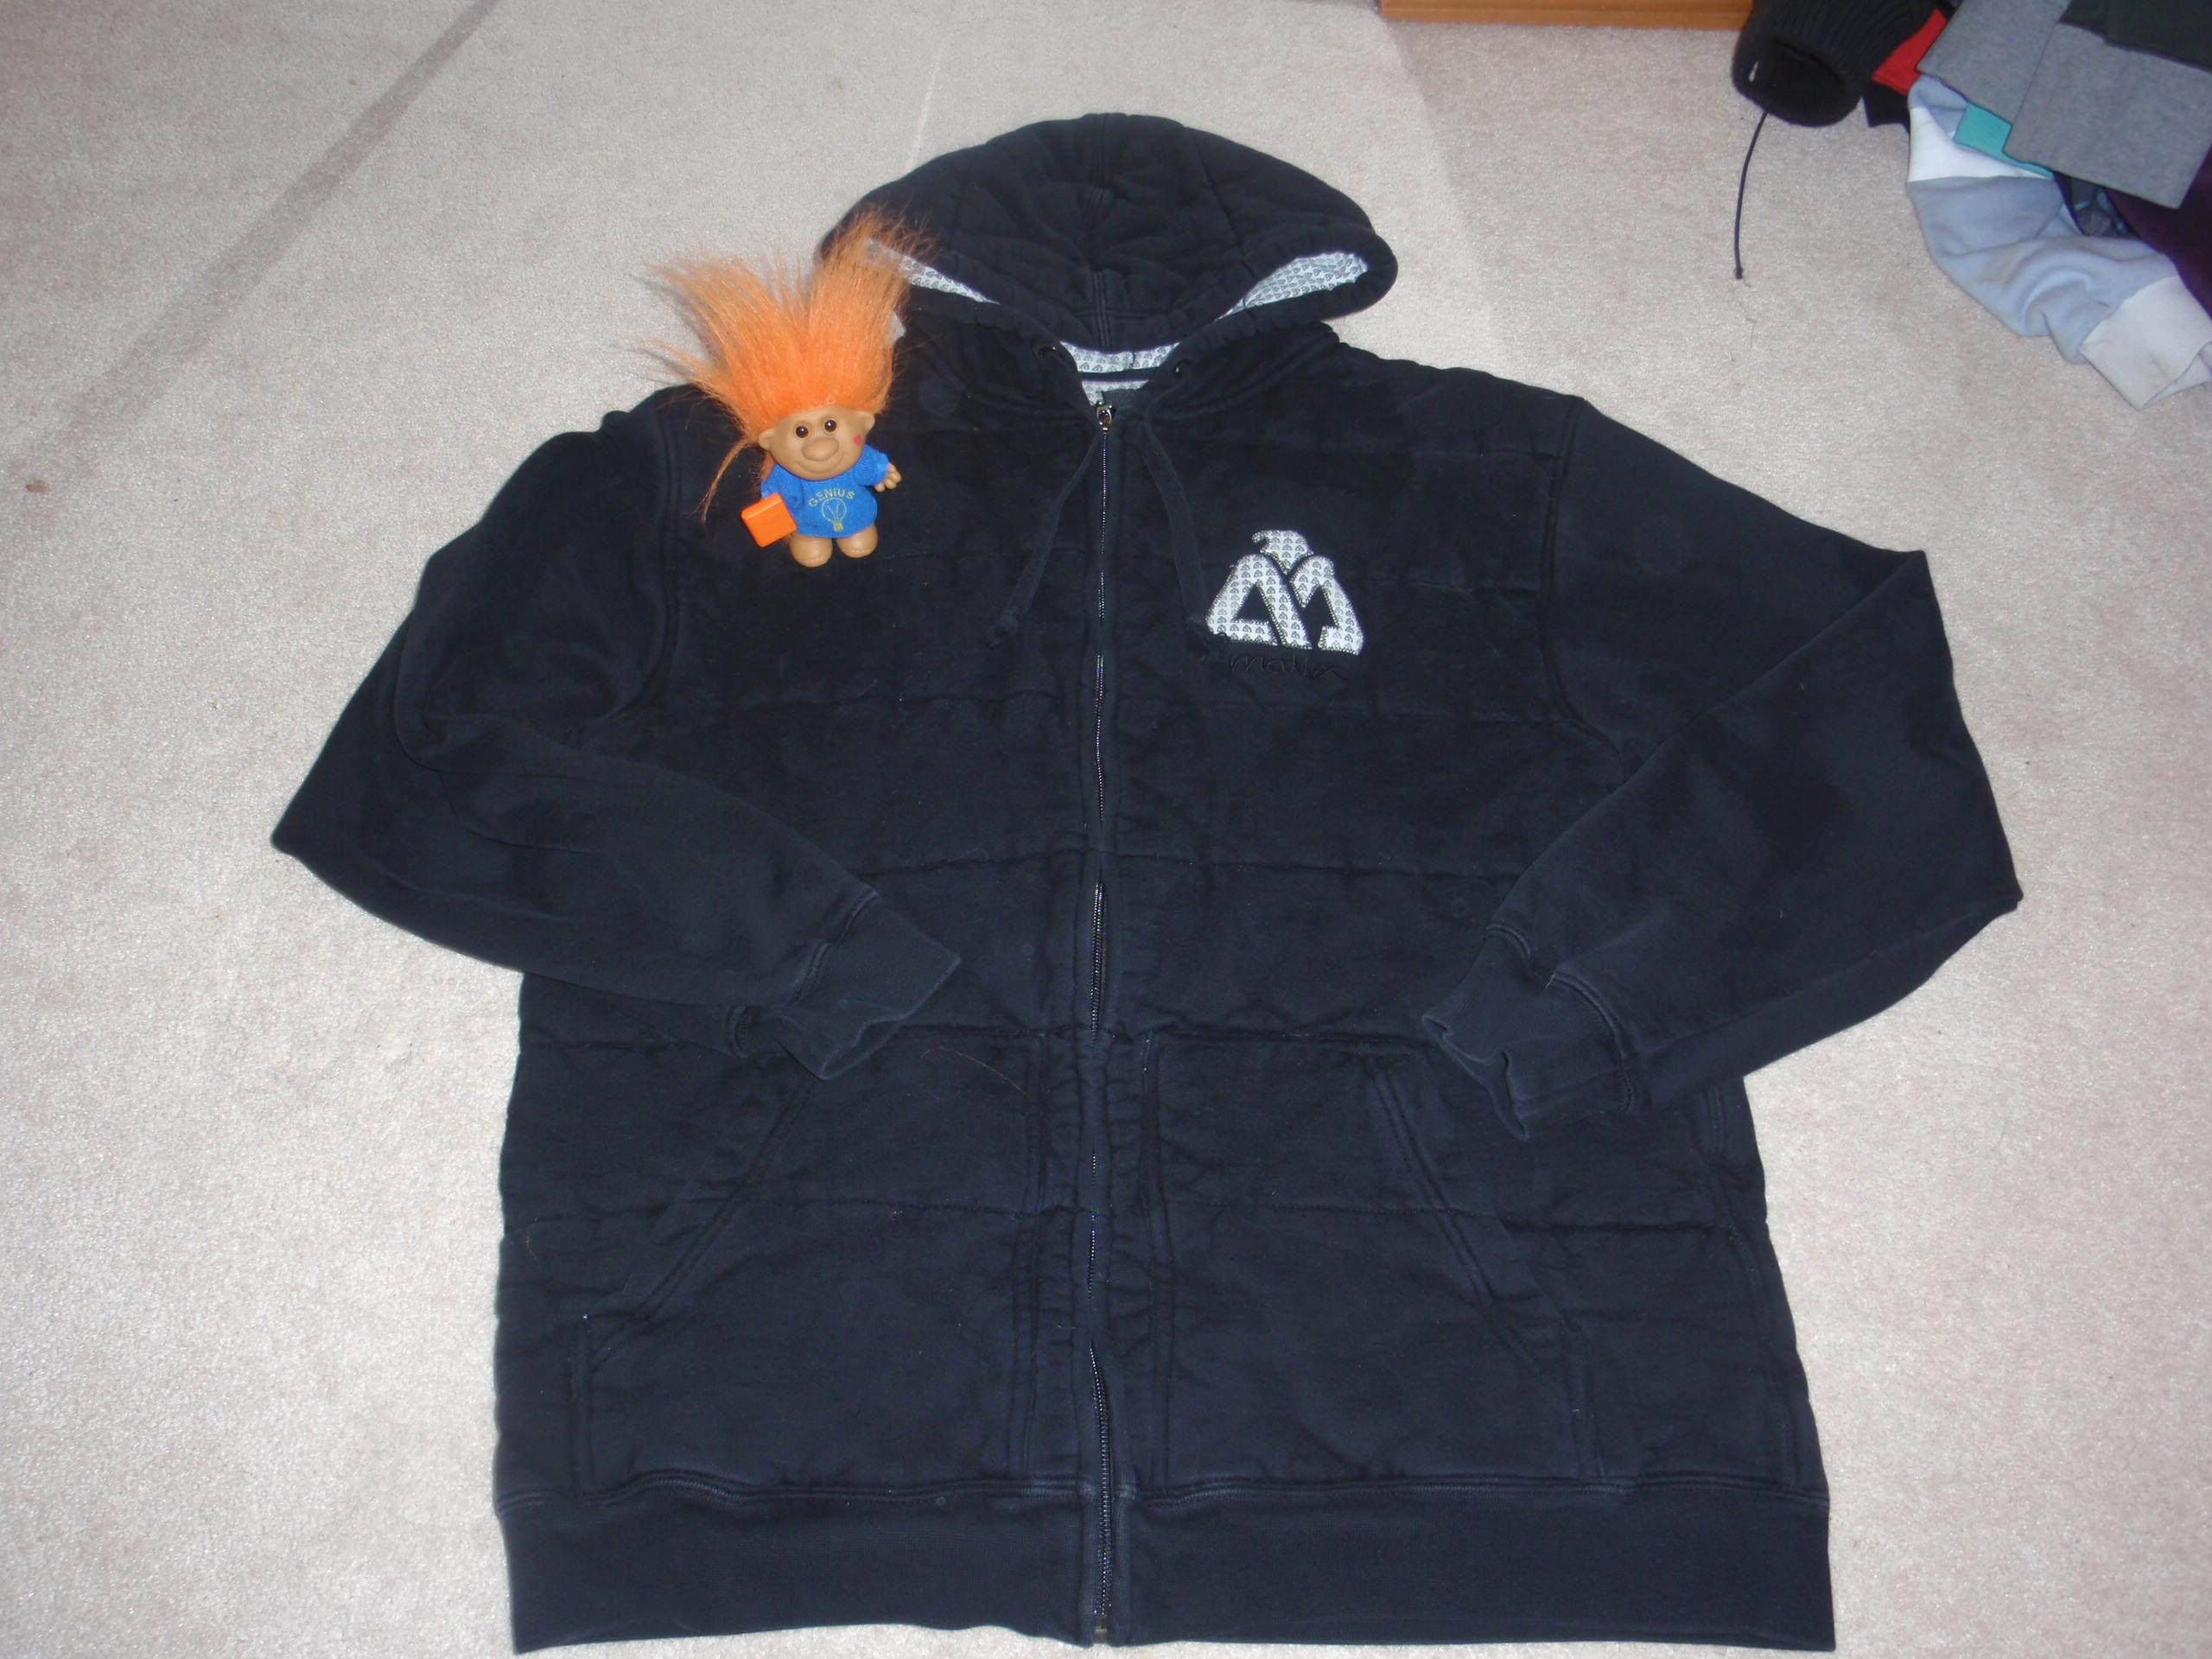 Matix hoodie